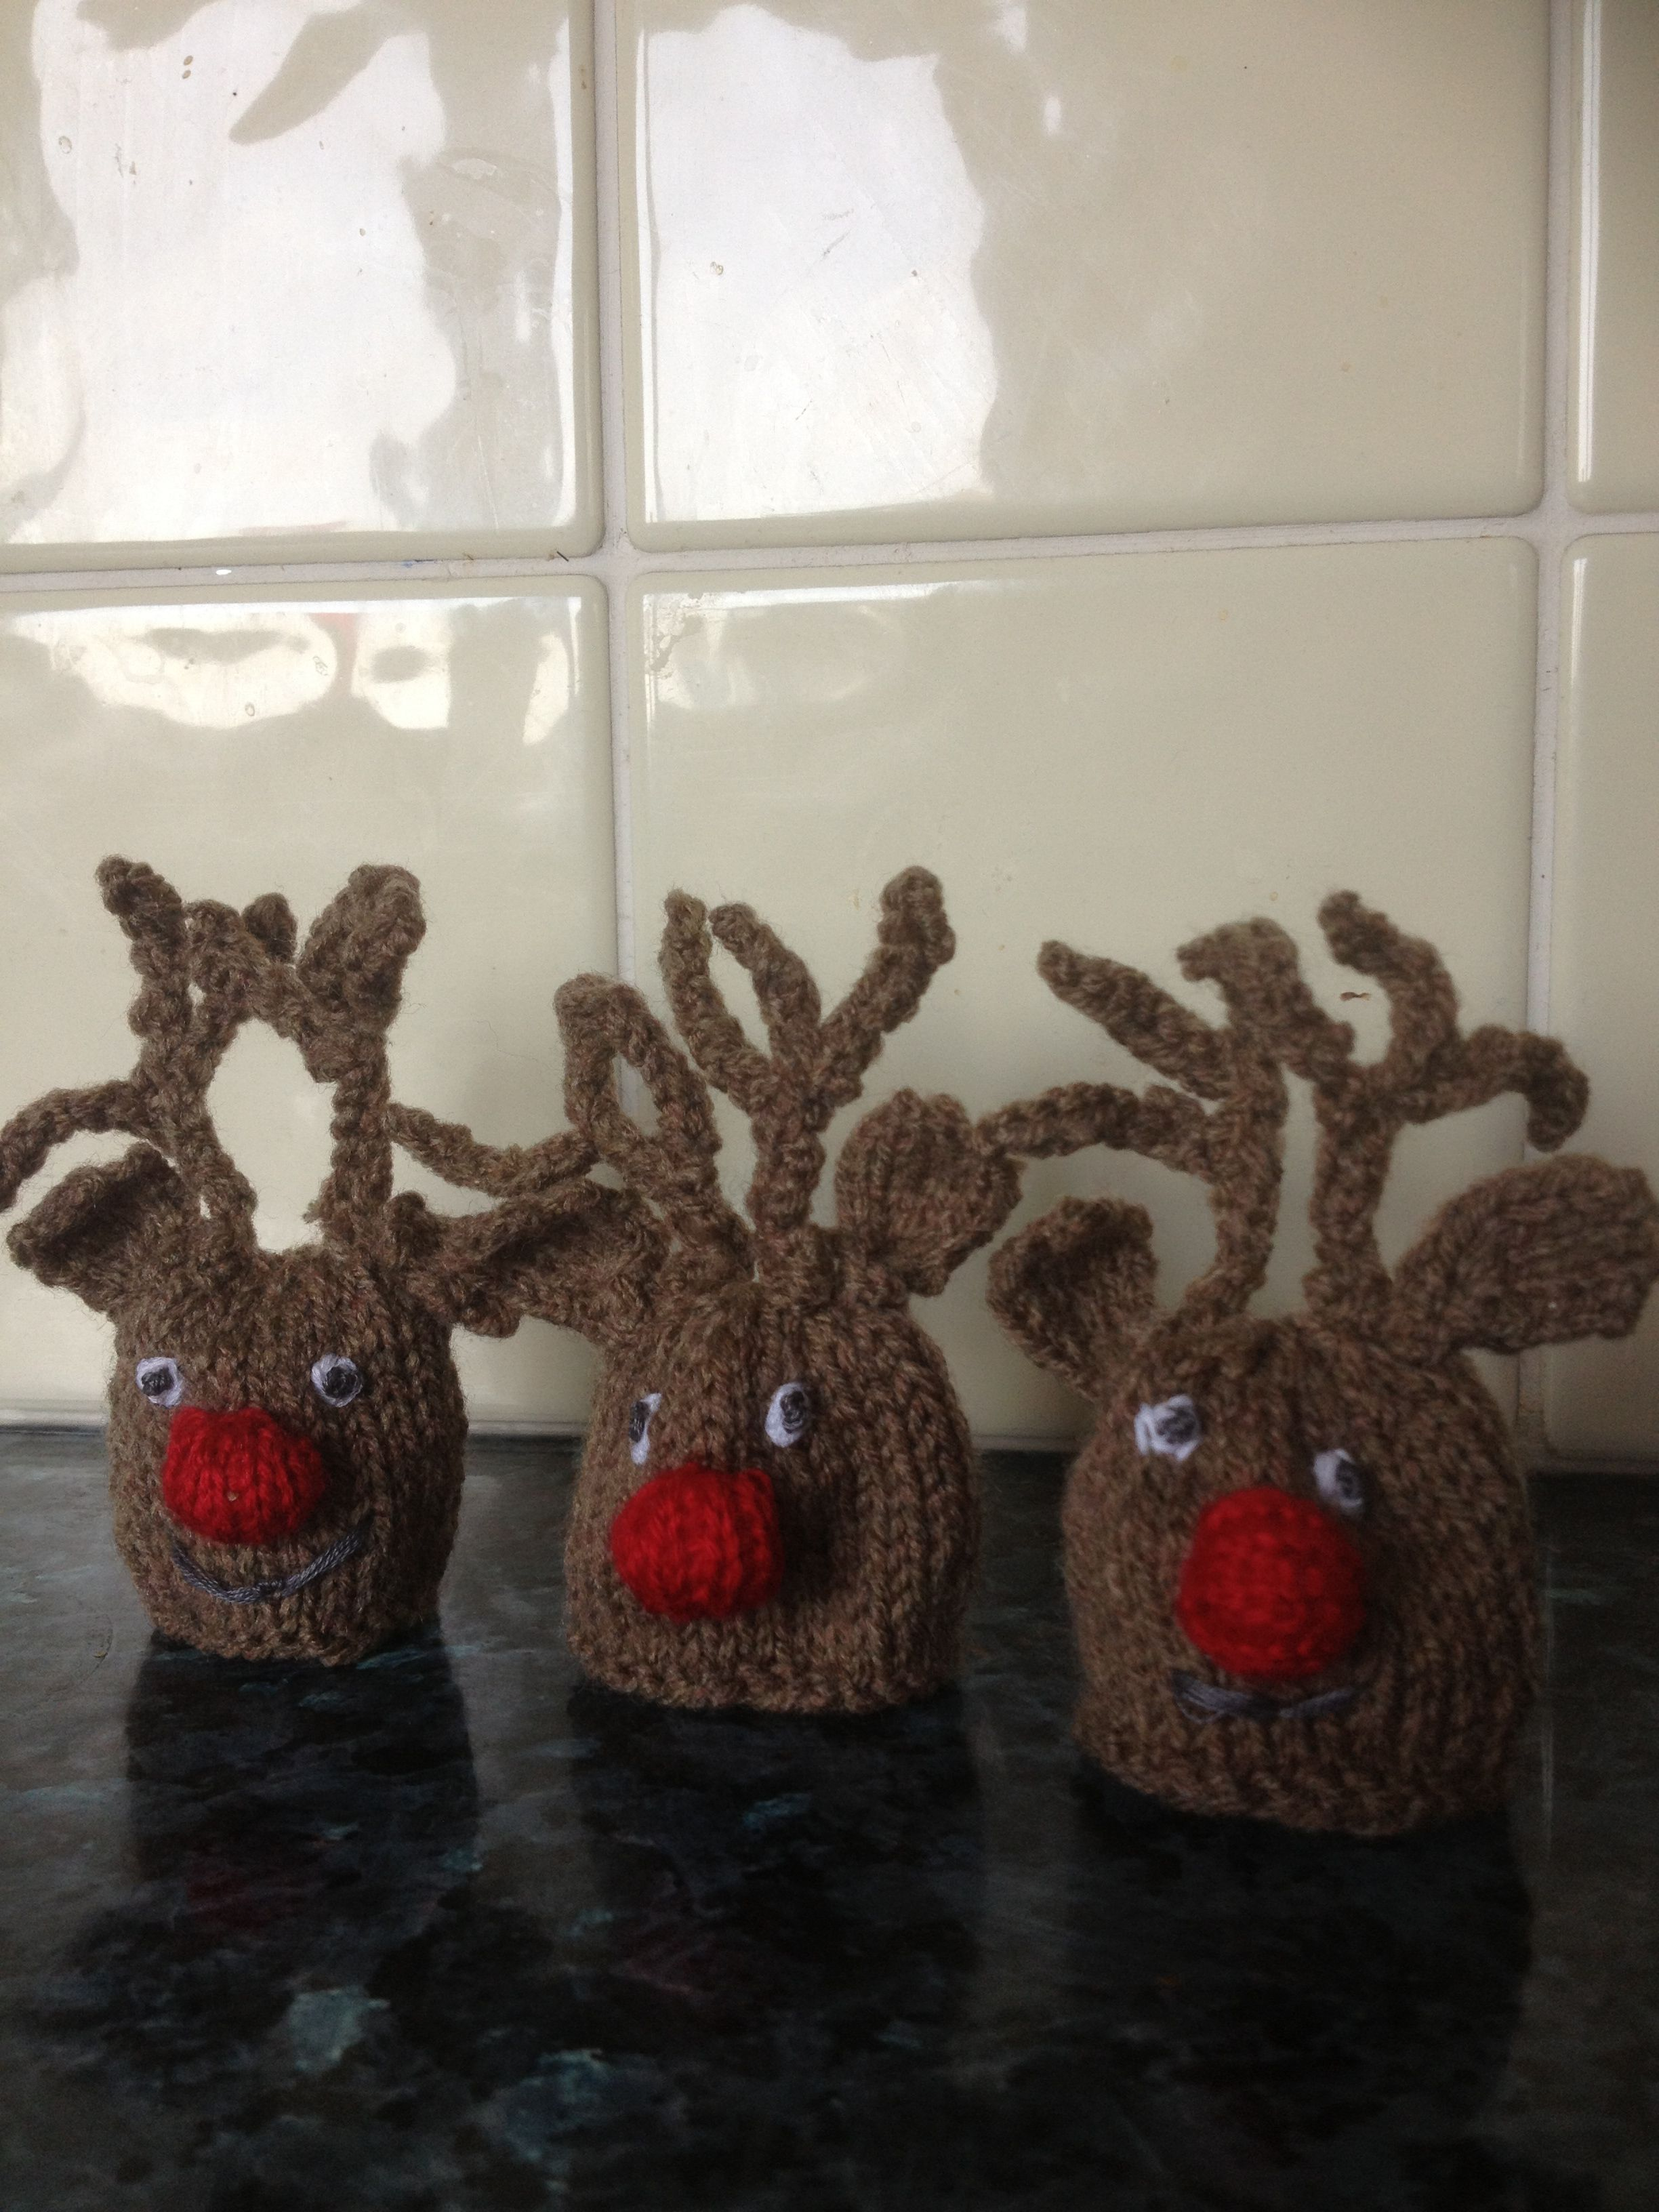 Ferrero Rocher covers | Christmas knitting, Twig crafts, Christmas knitting patterns